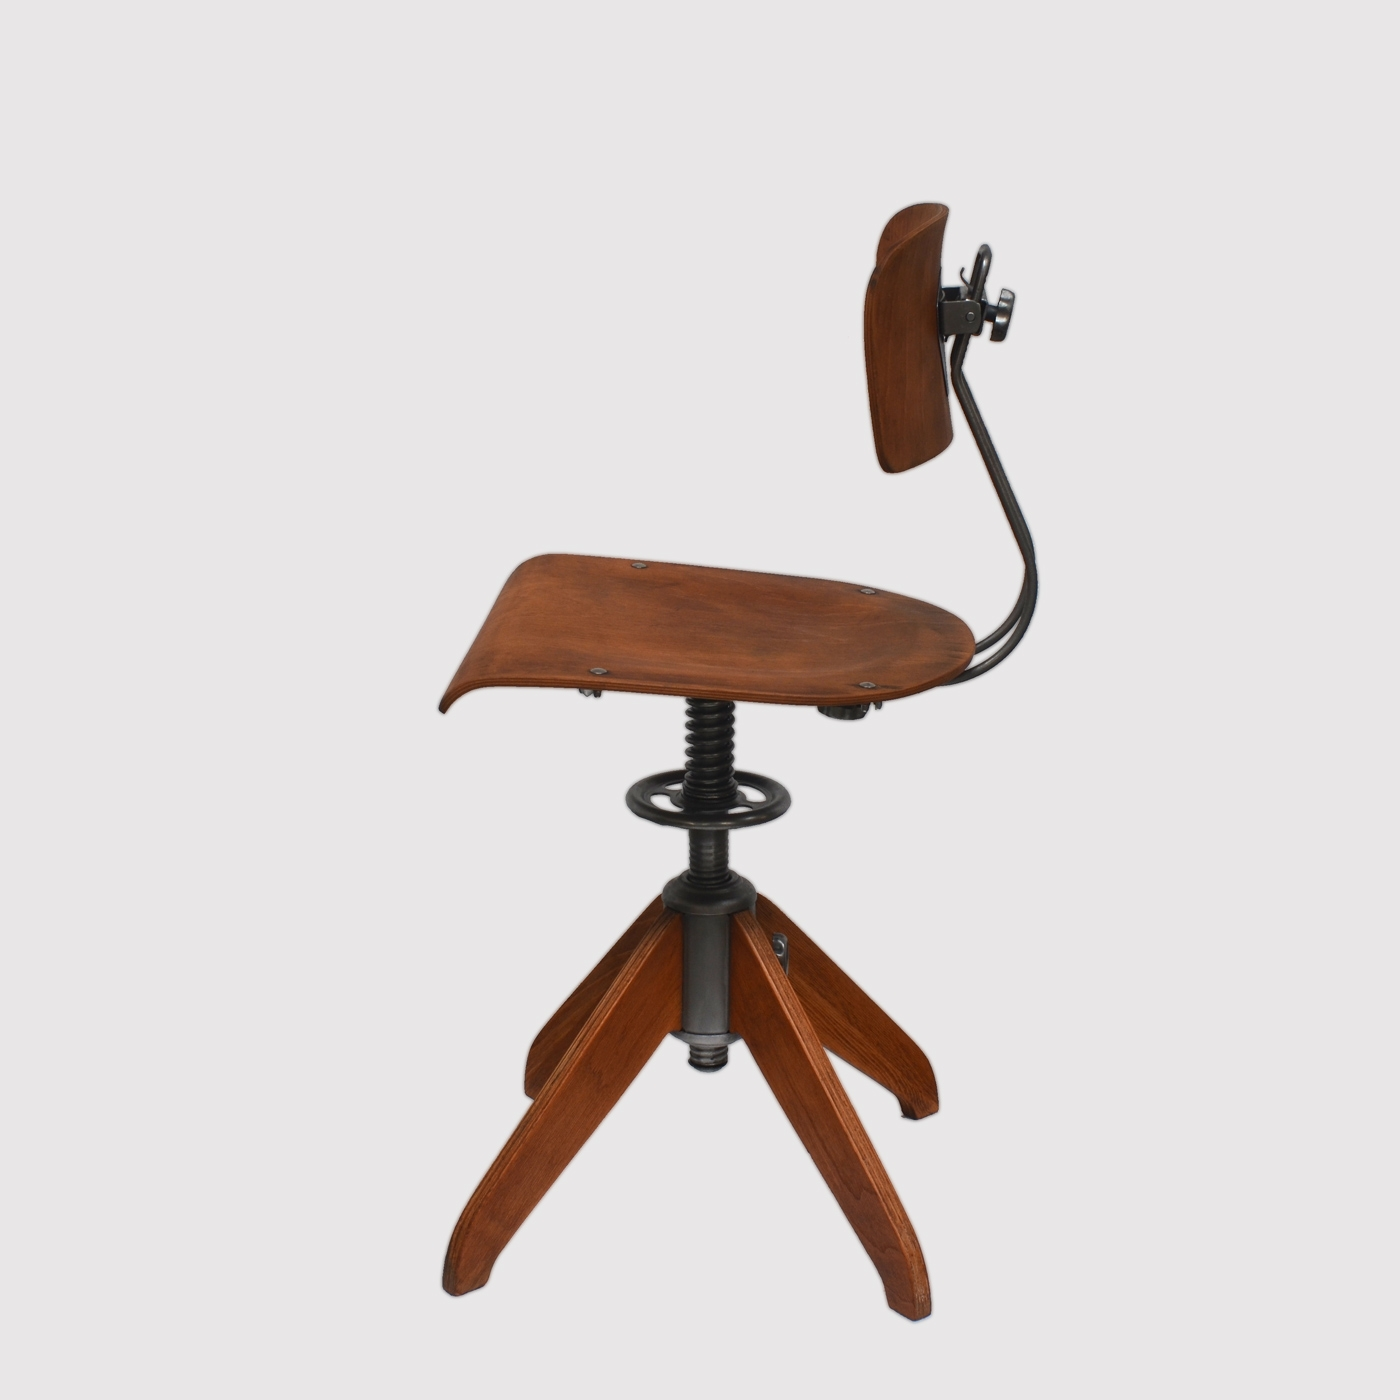 rowac architektenstuhl robert wagner chemnitz. Black Bedroom Furniture Sets. Home Design Ideas